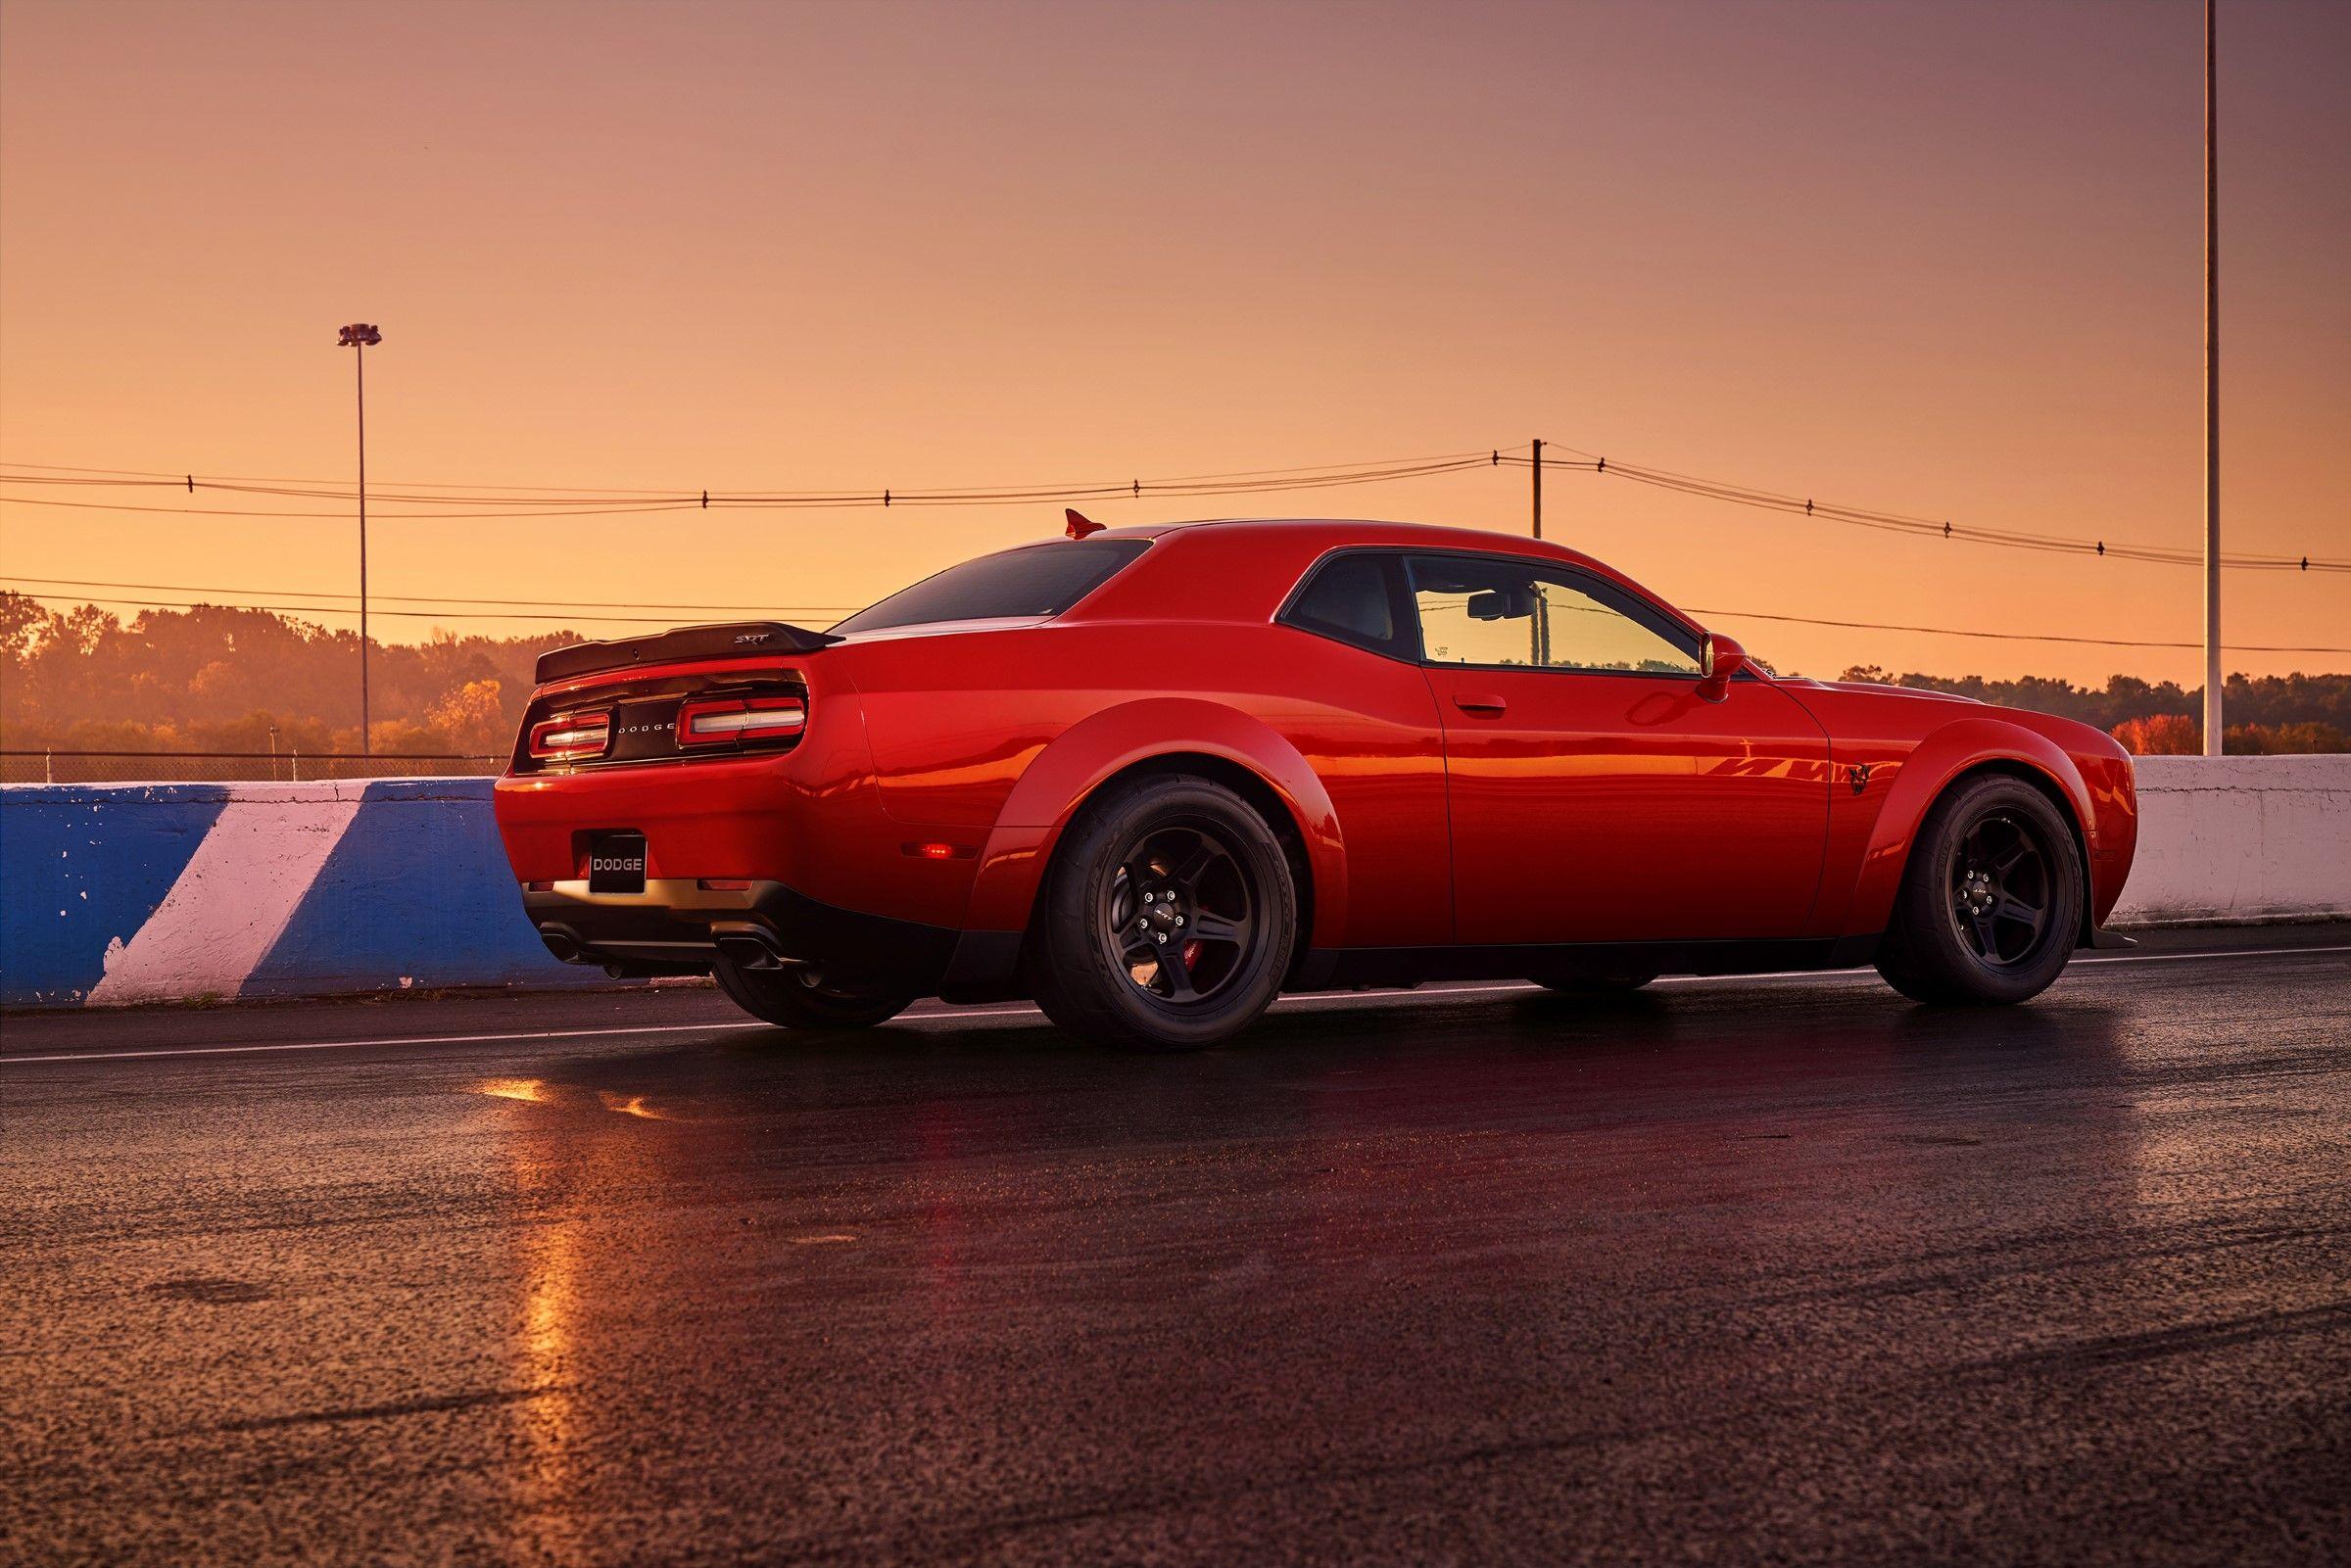 2018 Dodge Challenger Srt Demon 840 Hp 770 Torque 9 65 140 Mph Qtr 0 60 2 3 Secs 1 8g A Dodge Challenger Srt Dodge Challenger 2018 Dodge Challenger Srt